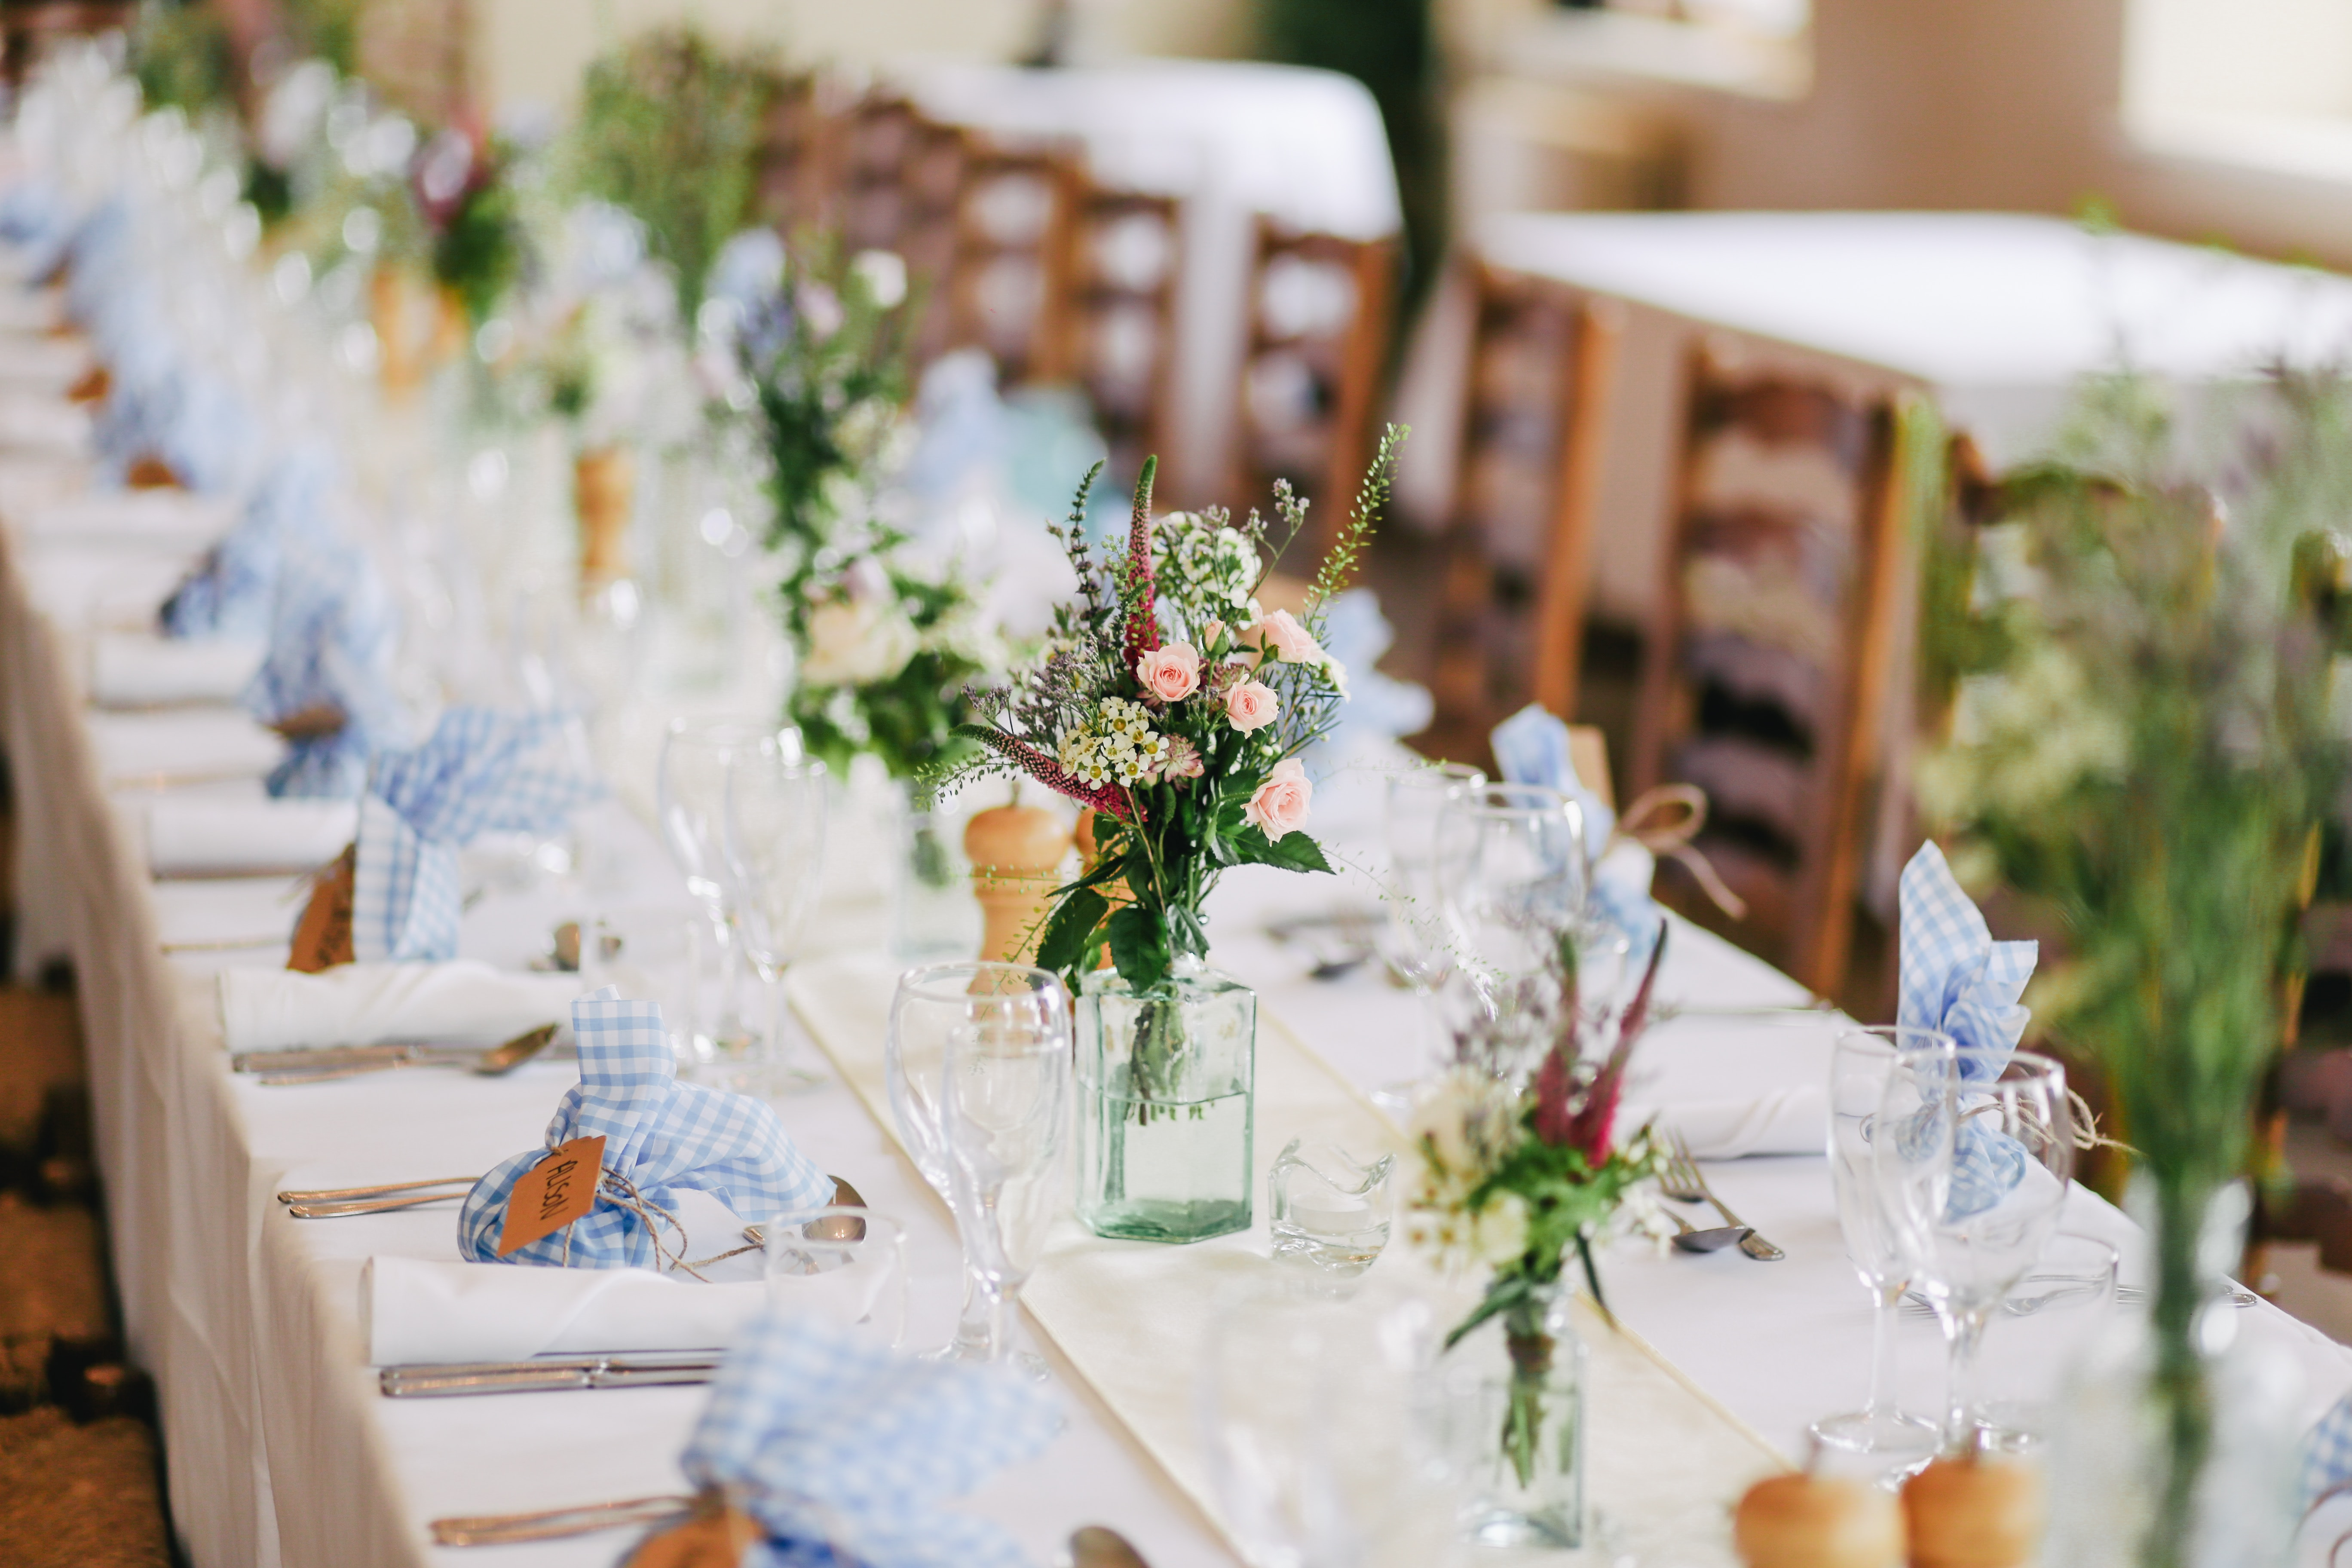 9 Trending Table Runners for Weddings - mywedding